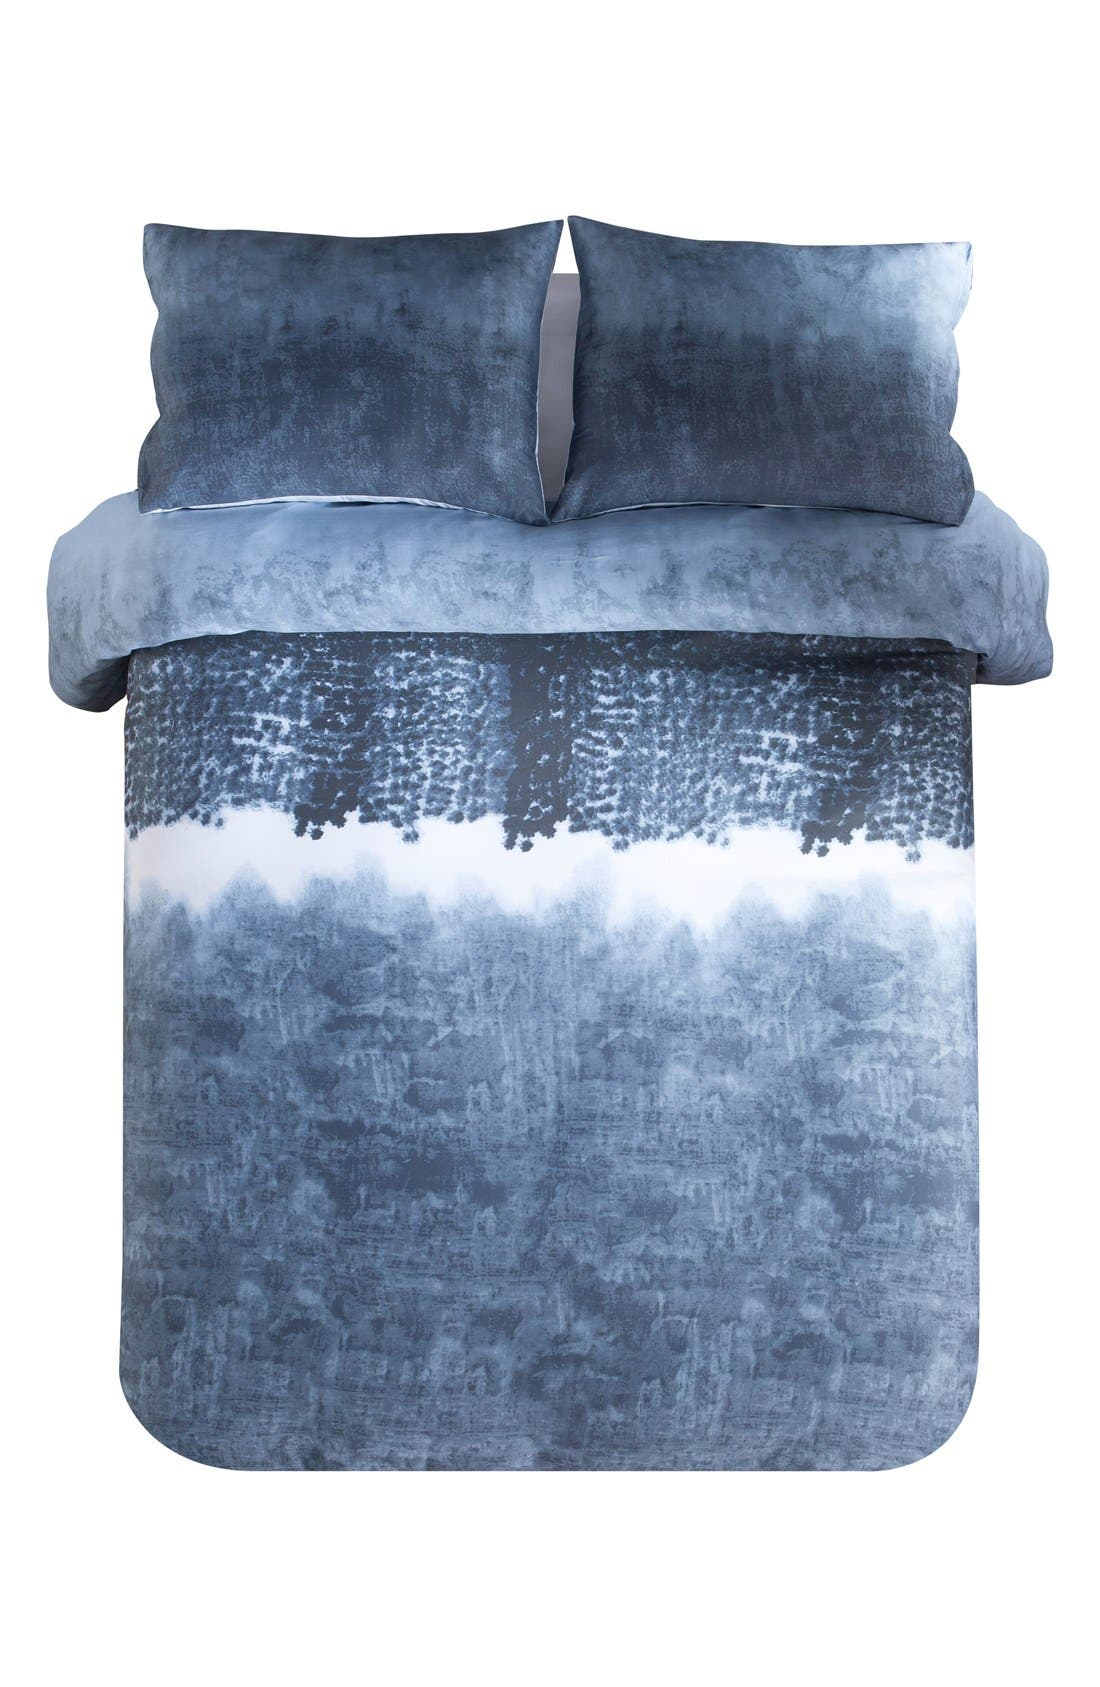 Janie 300 Thread Count Duvet Cover & Sham Set,                             Main thumbnail 1, color,                             DENIM BLUE